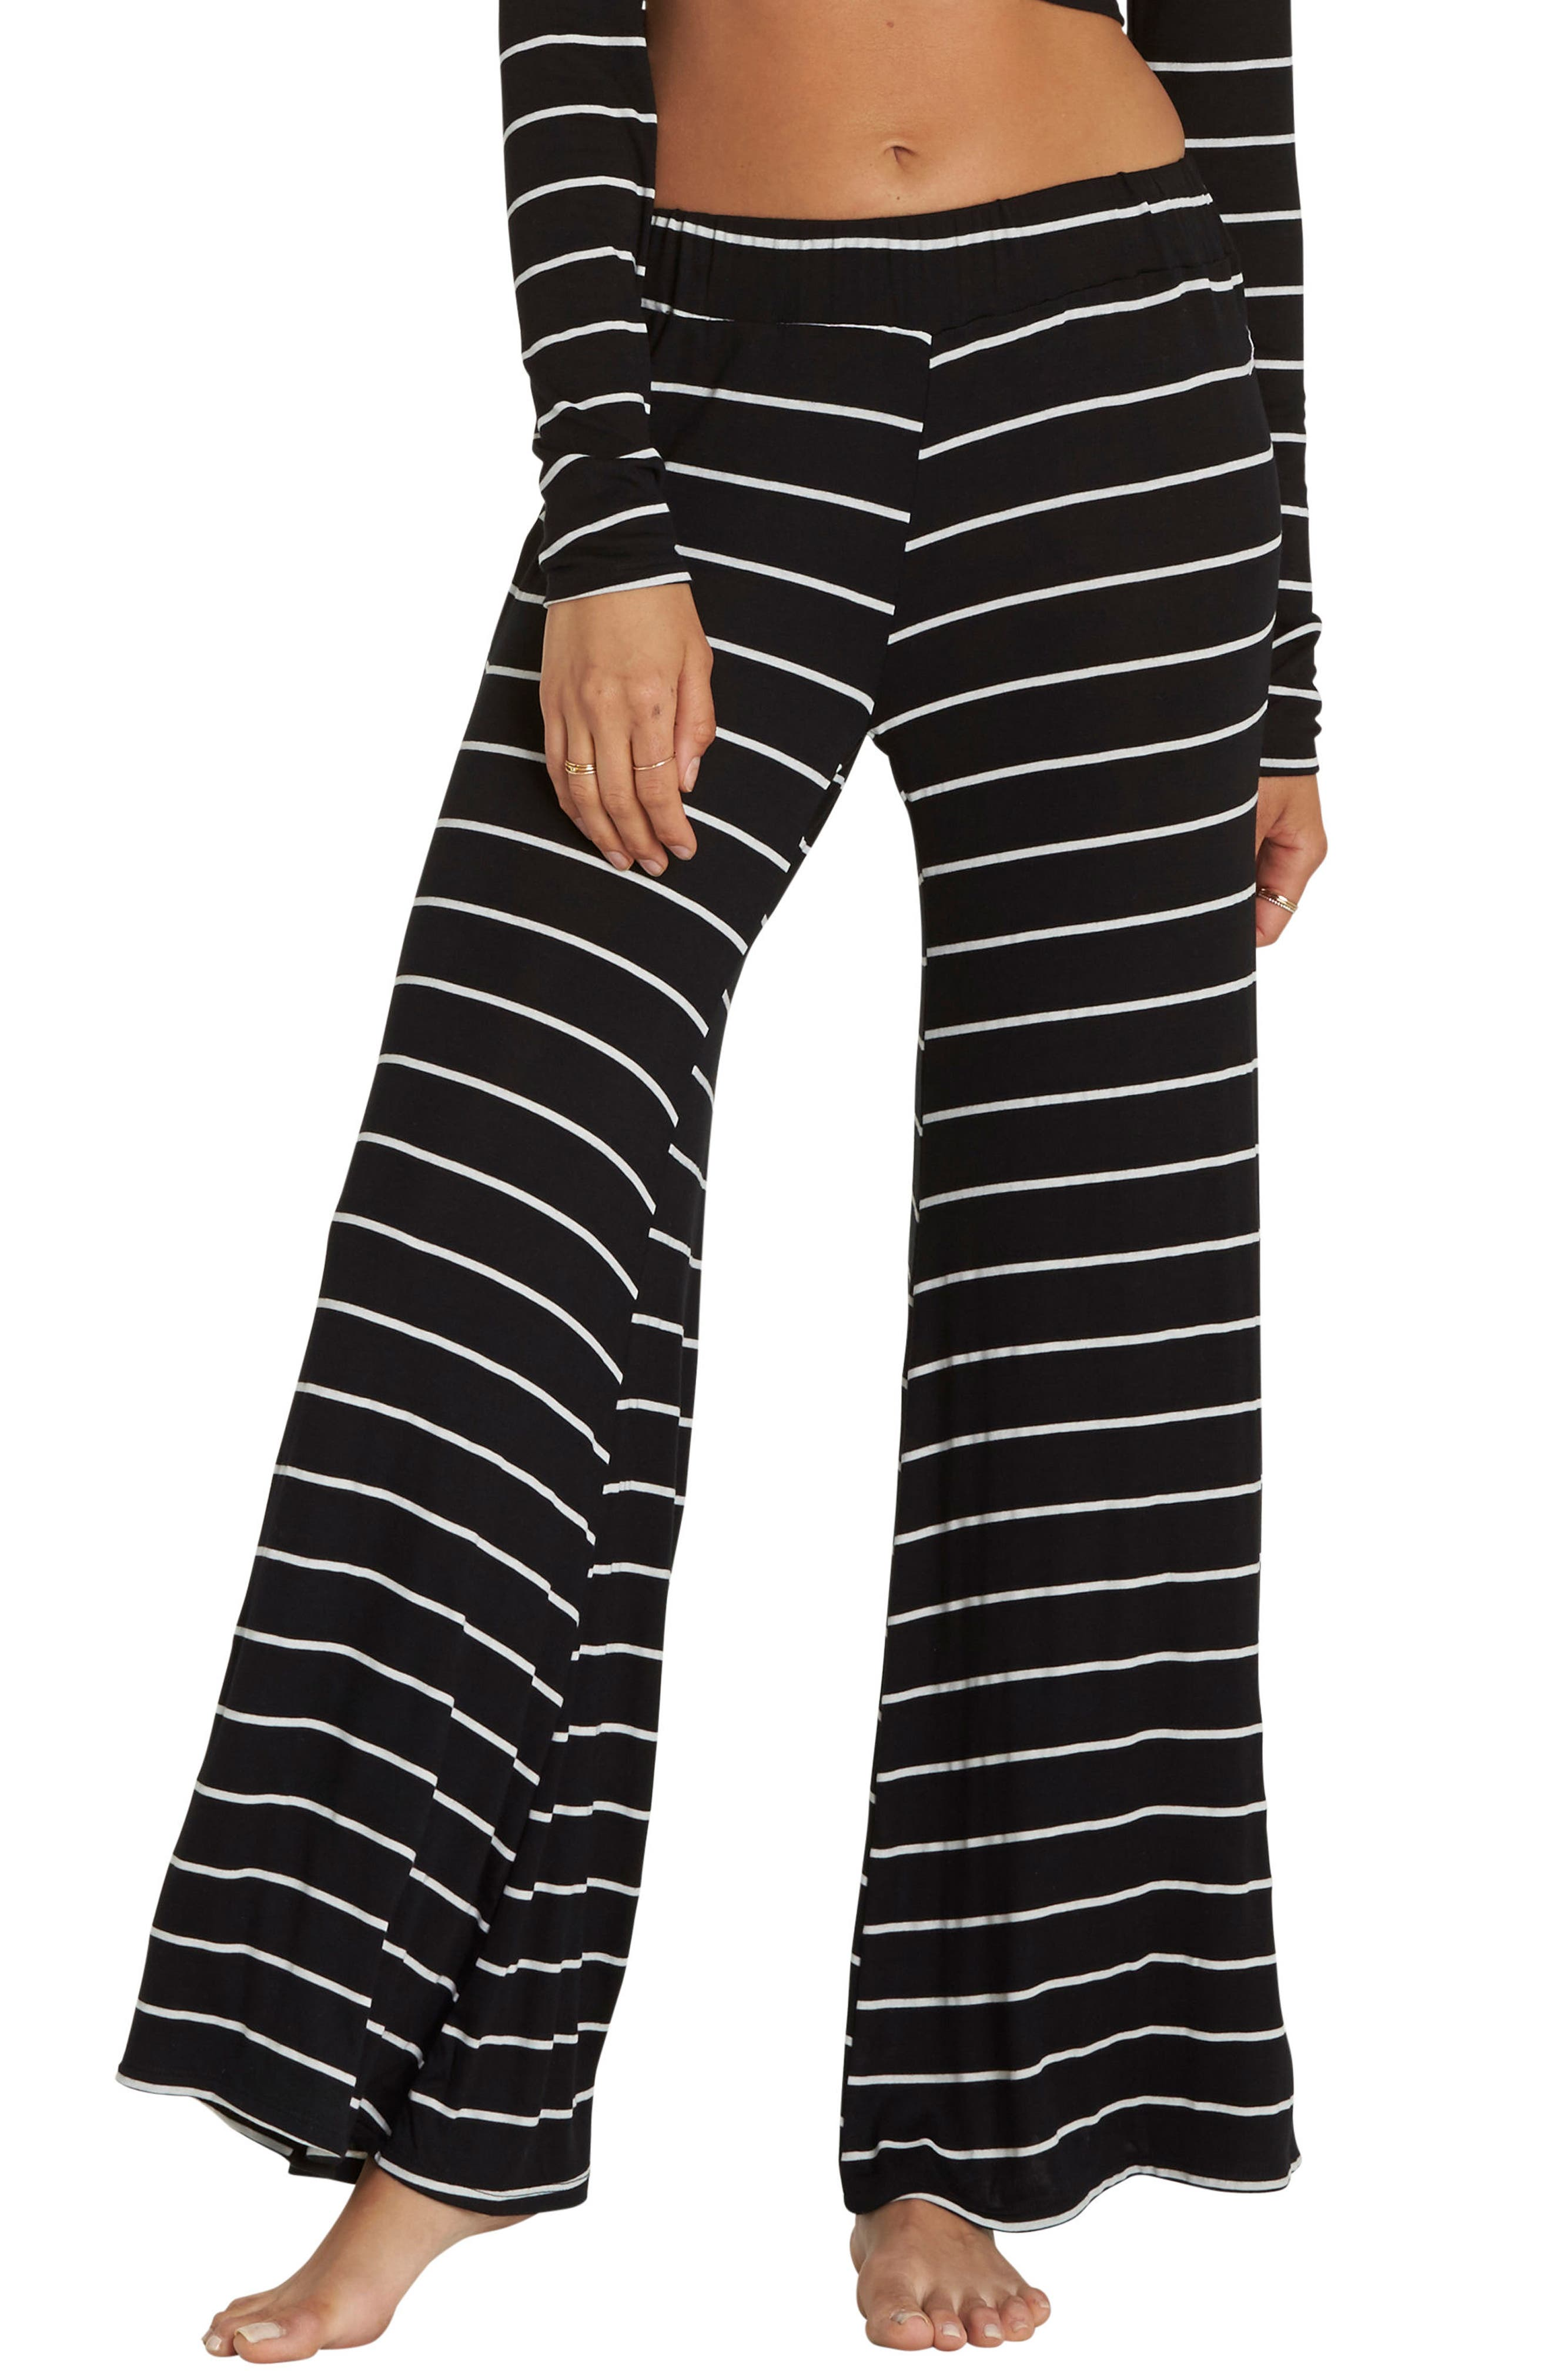 Alternate Image 1 Selected - Billabong She Goes Pants